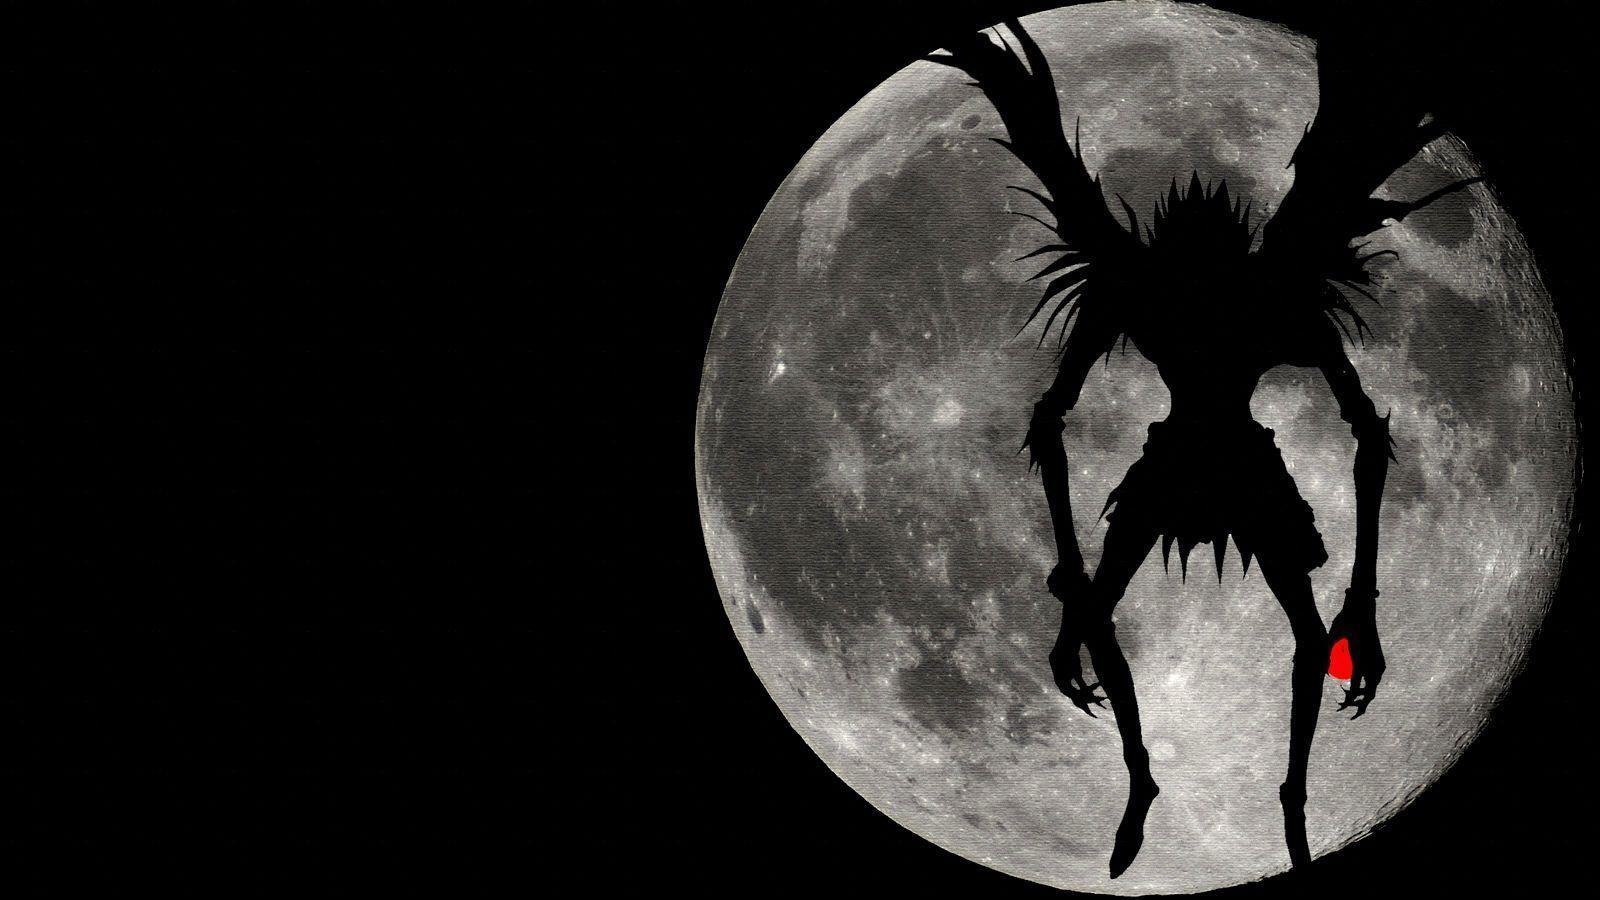 1600x900 Death Note Shinigami Ryuk Shadow Full Moon Hình nền.  Anime x